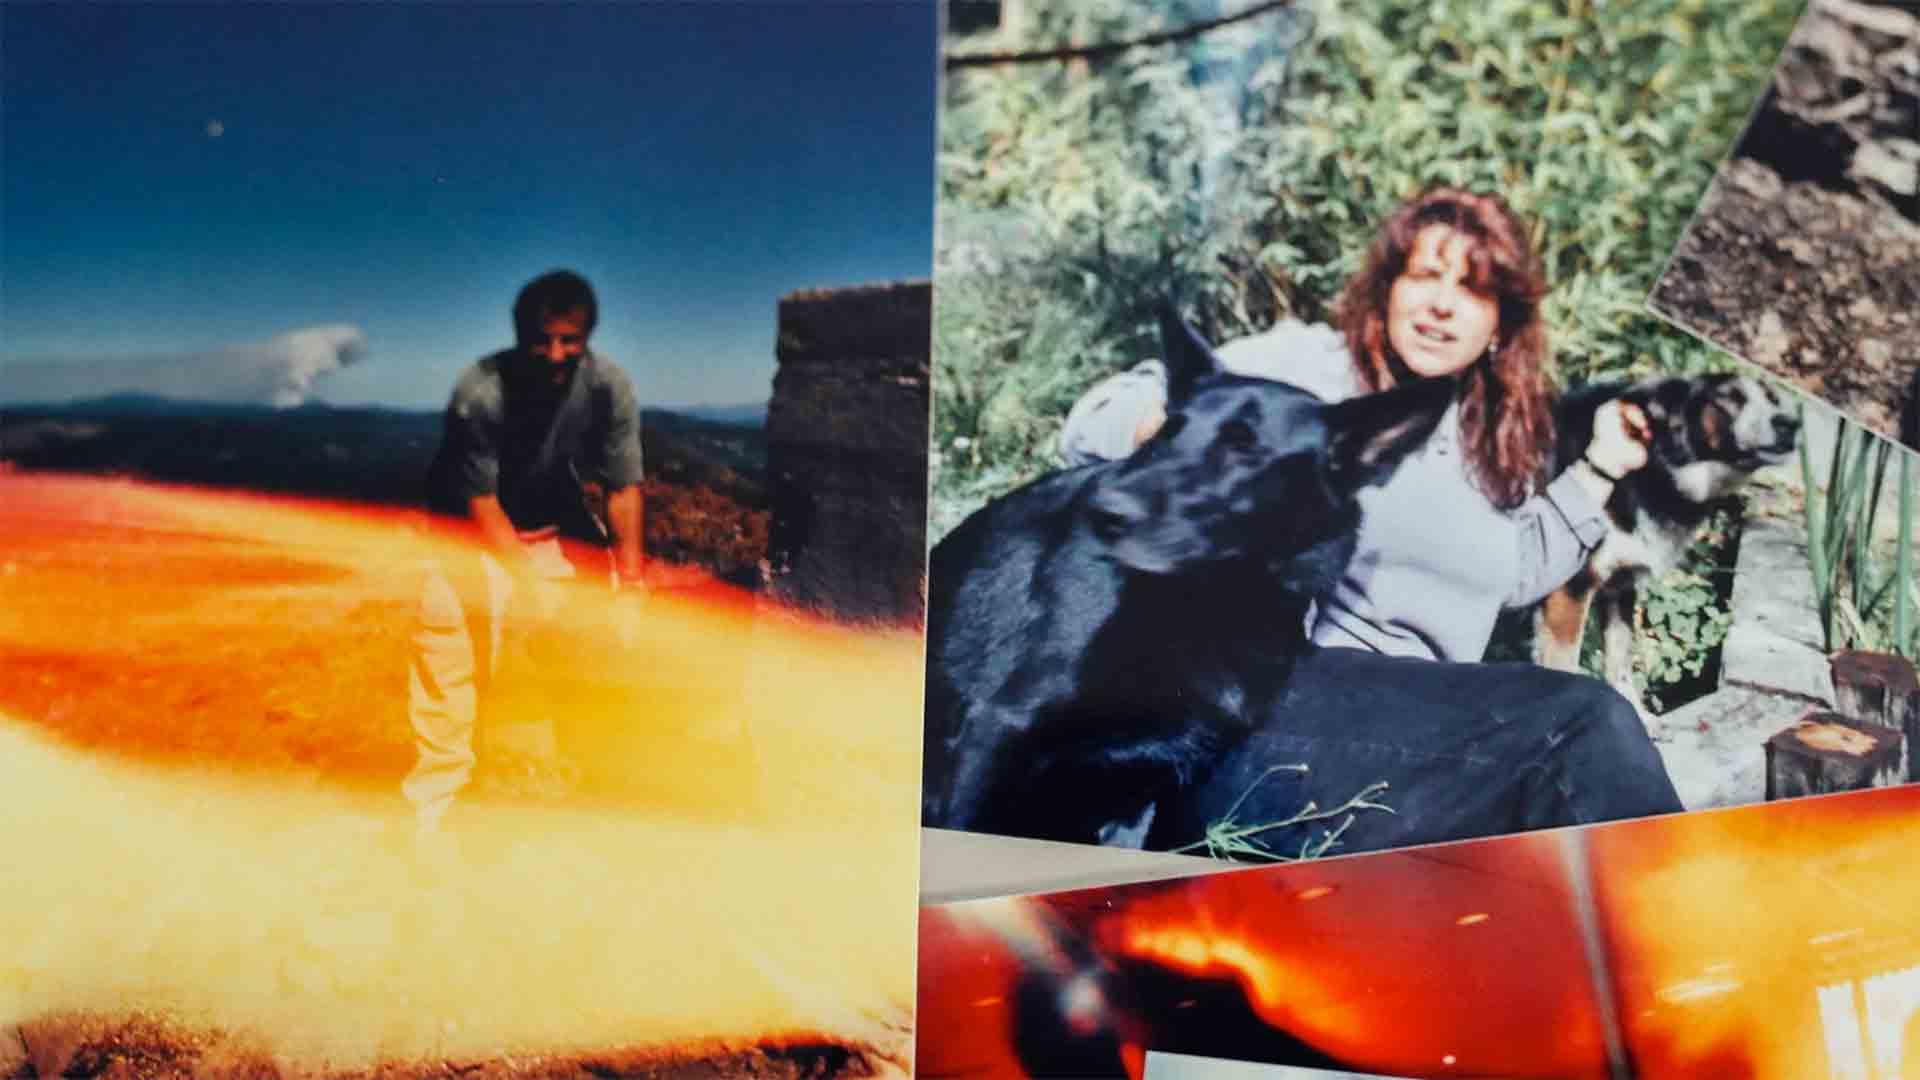 Photos of Rich and Lori around 2001.